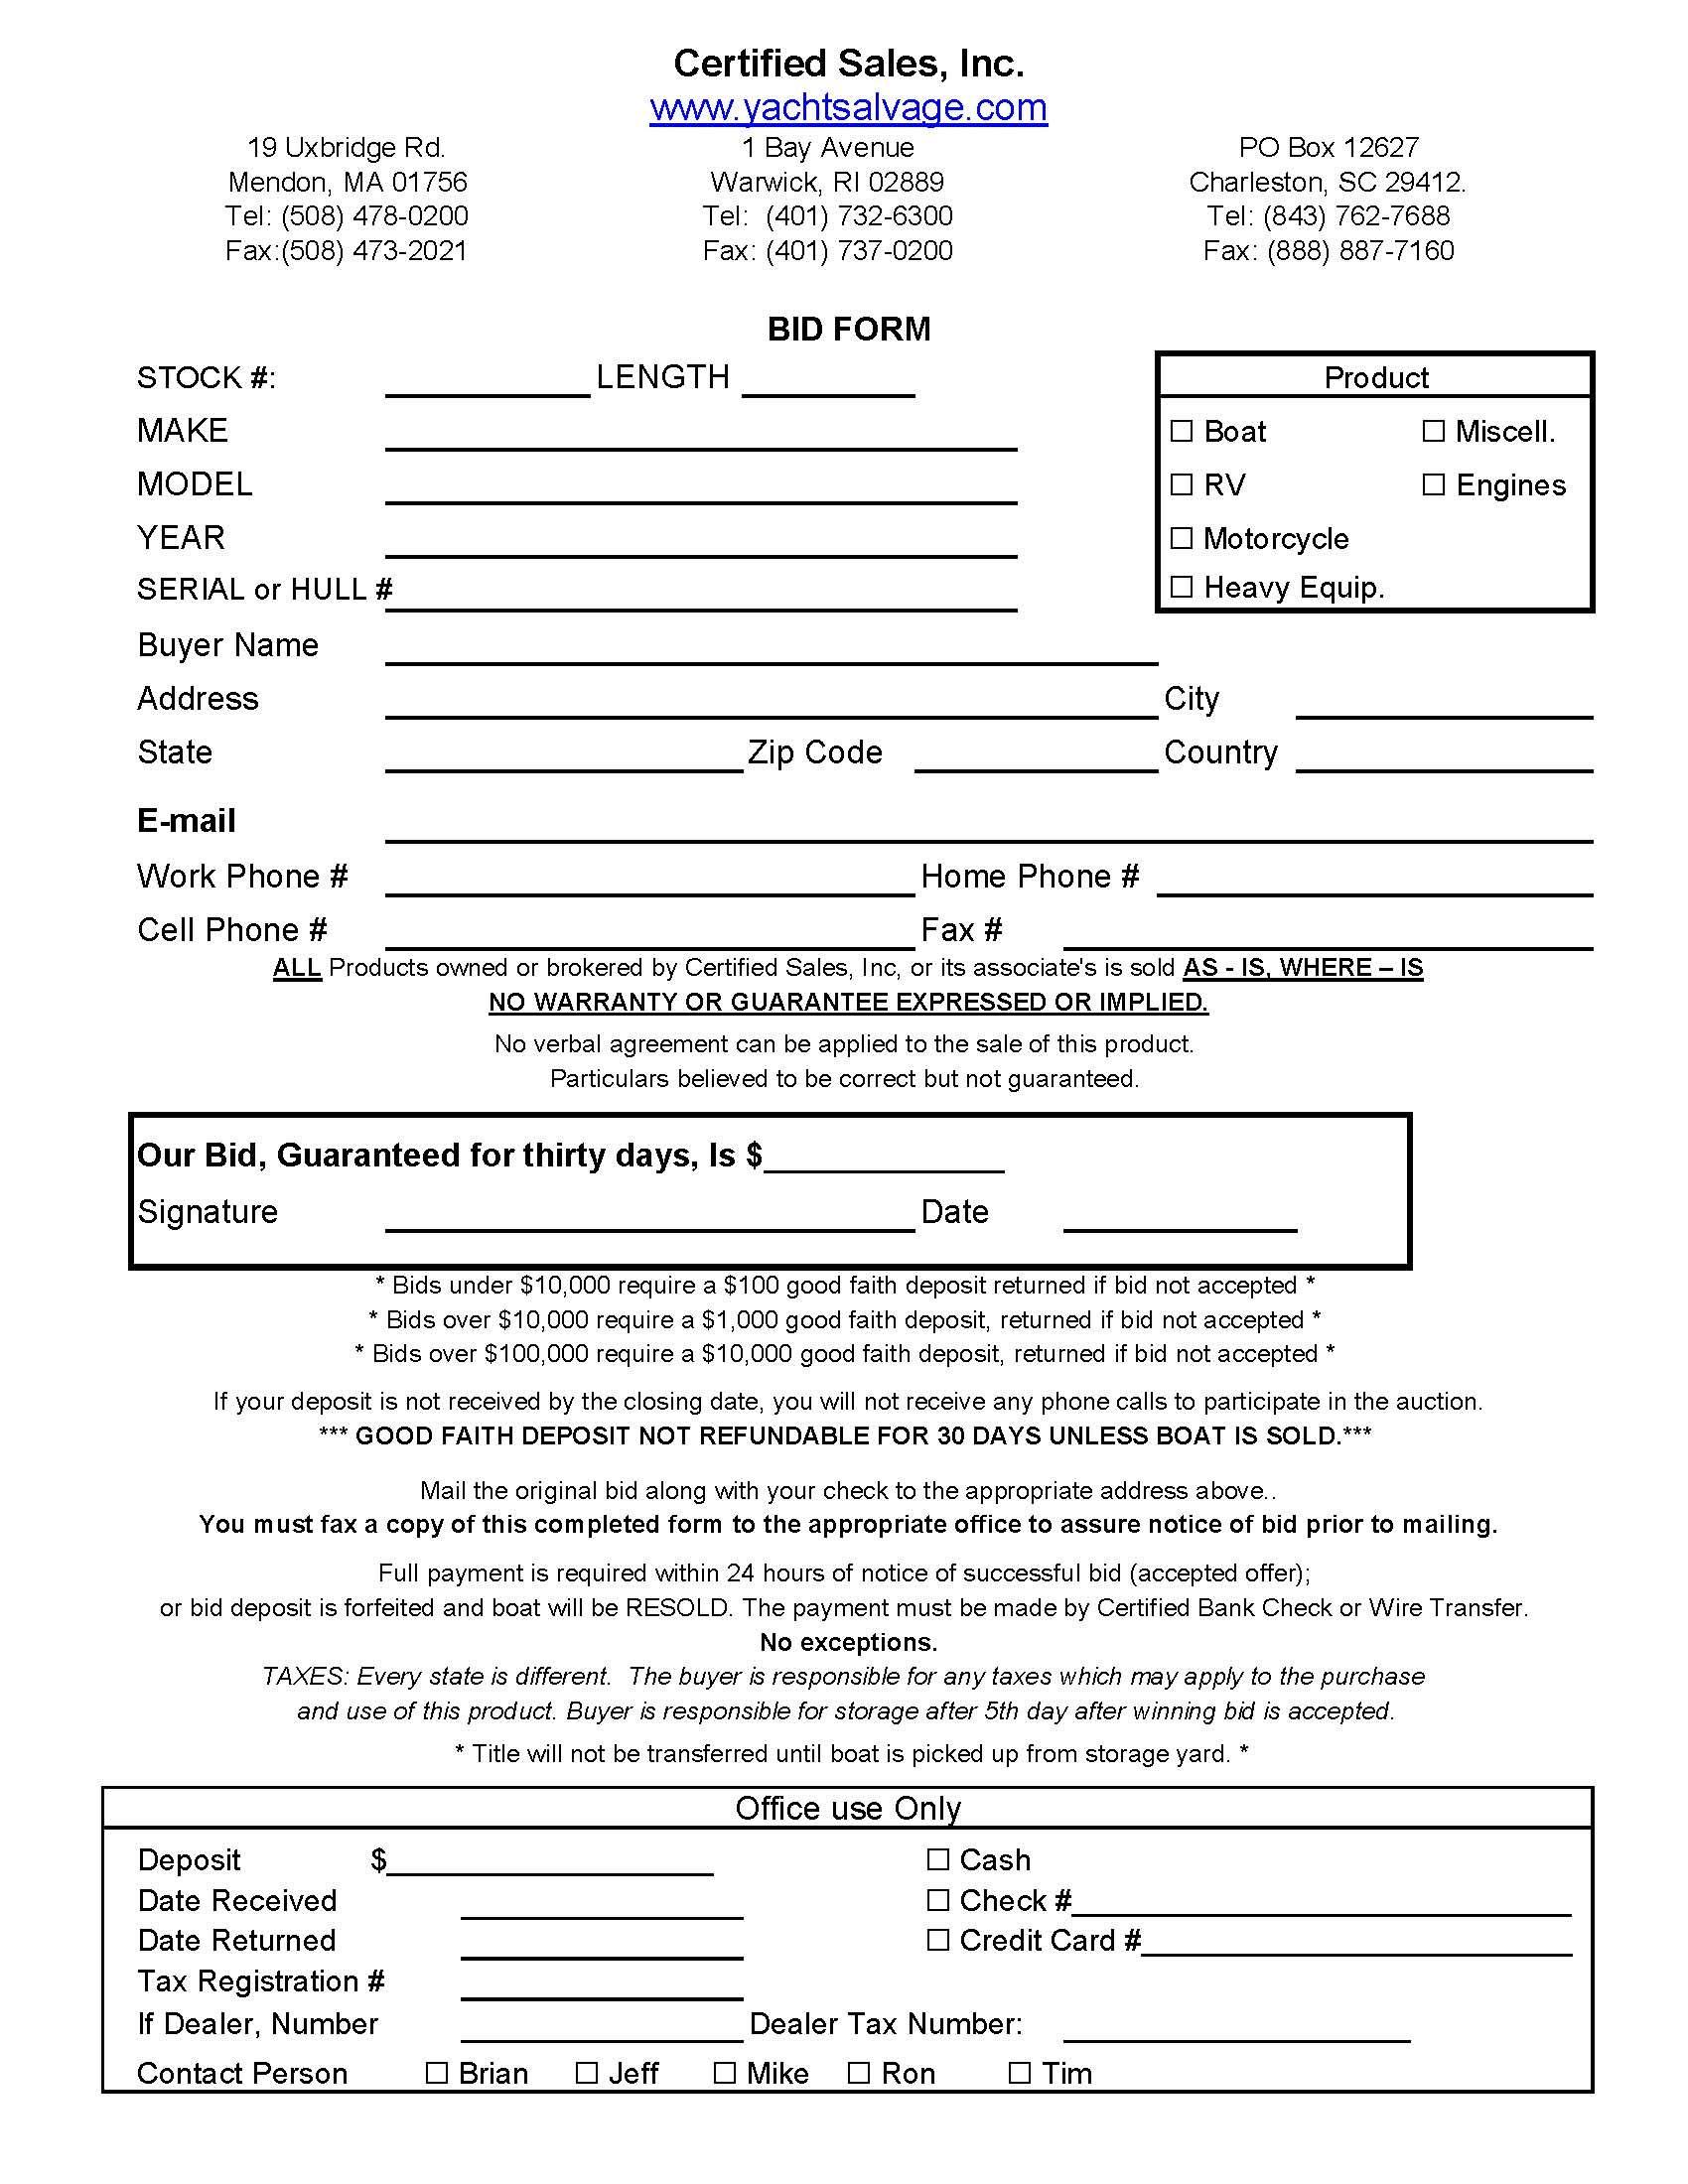 bid form page 1 jpg bid form legal documents pinterest